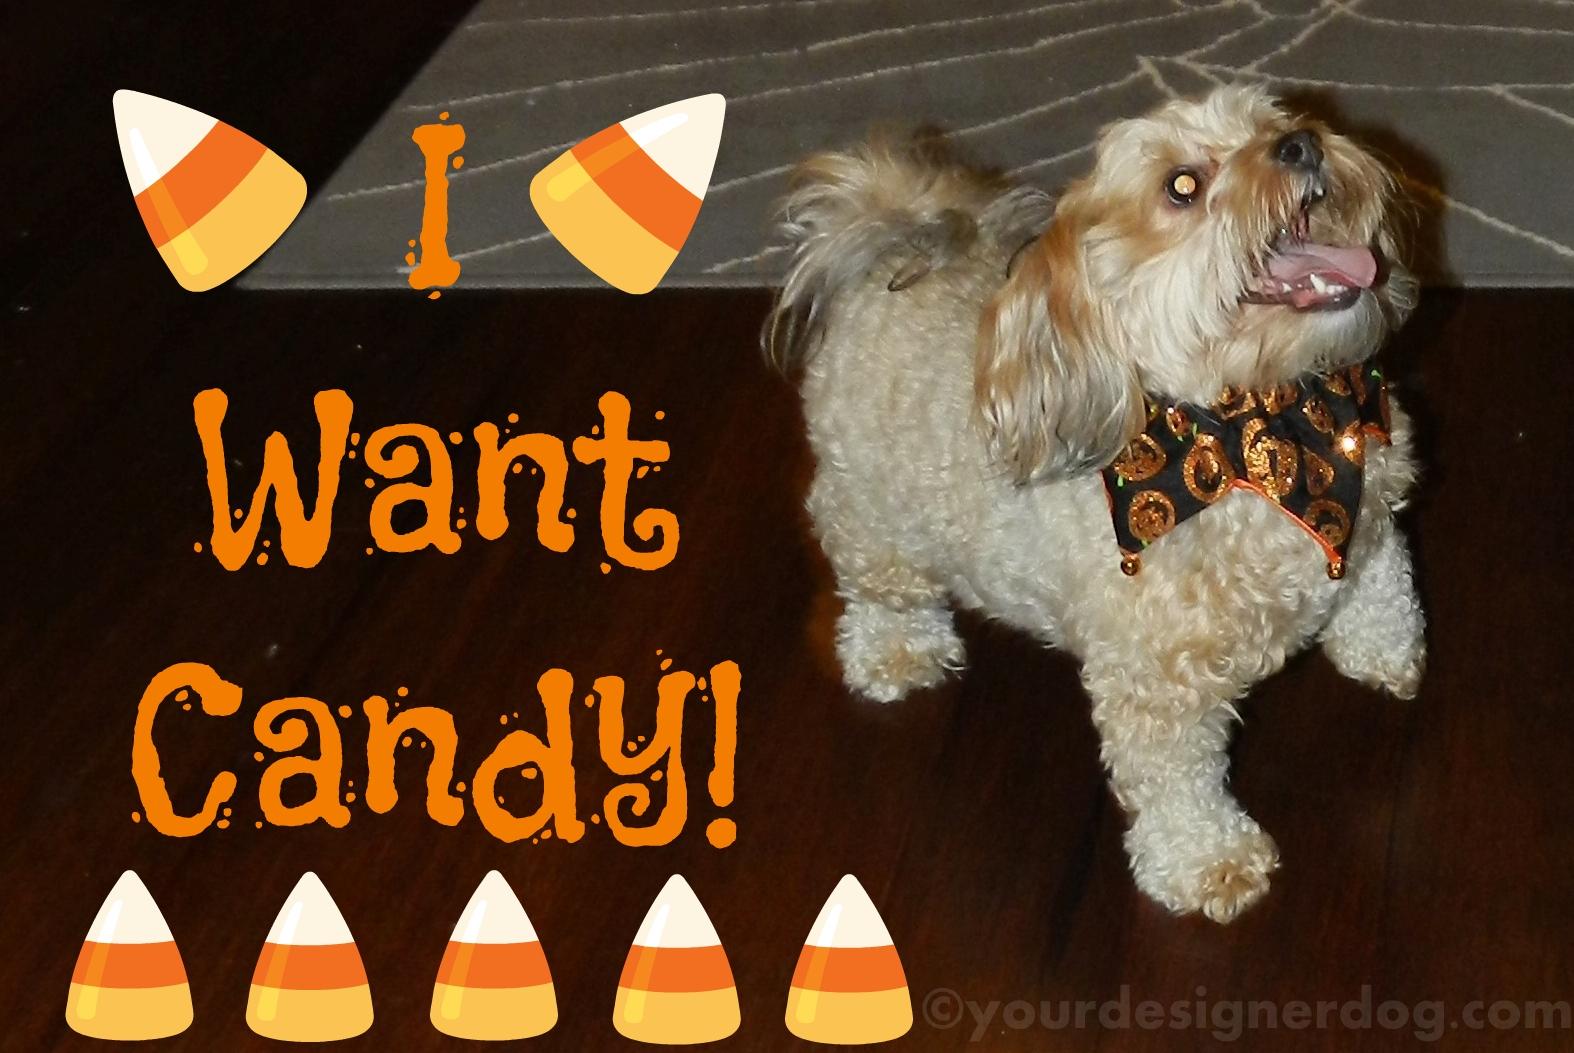 dogs, designer dogs, yorkipoo, yorkie poo, candy, halloween